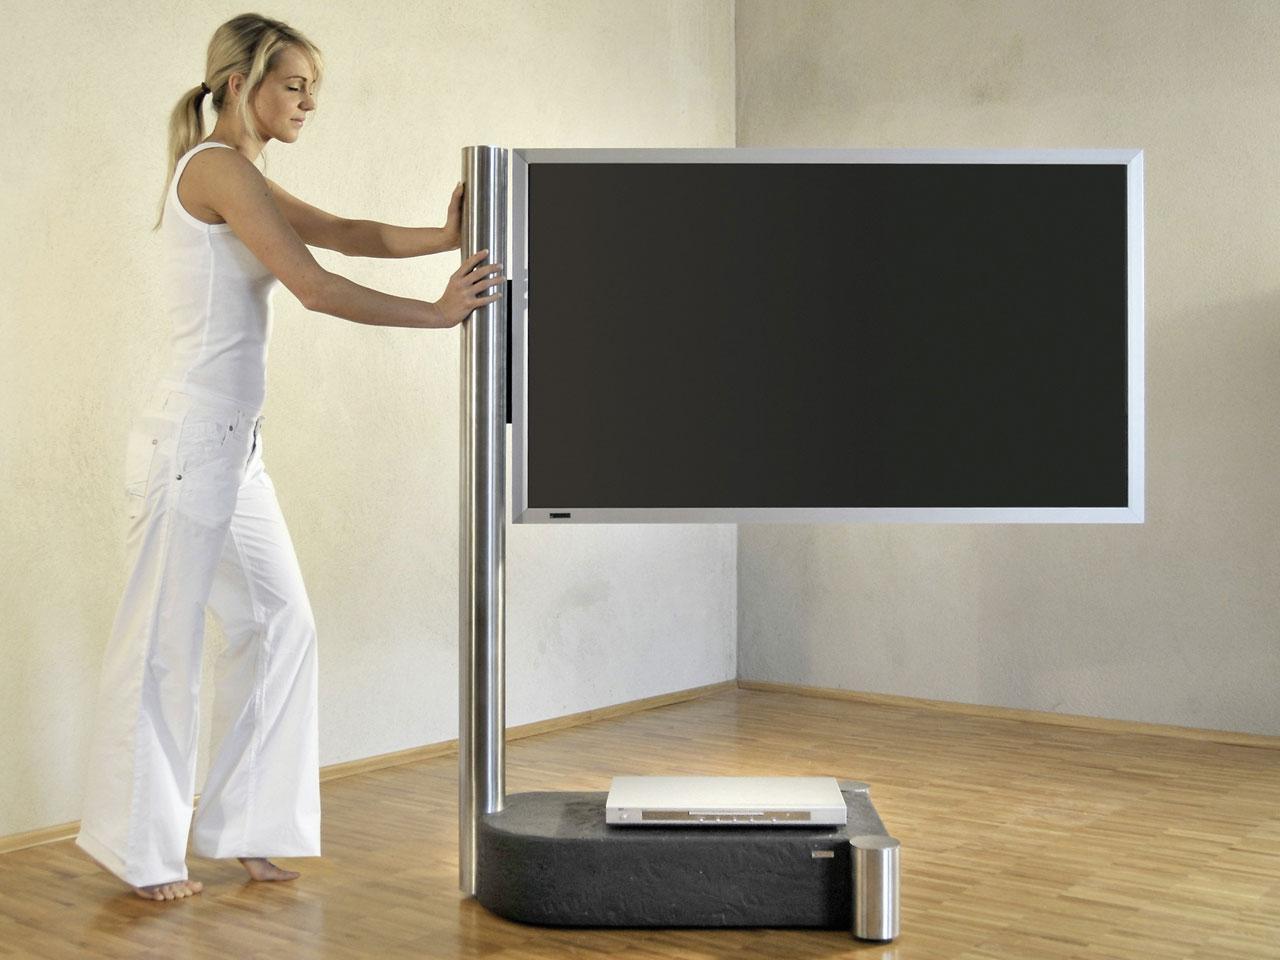 Wissmann tv halter individual art110 g nstig kaufen cmb - Tv wandhalterung 75 zoll ...